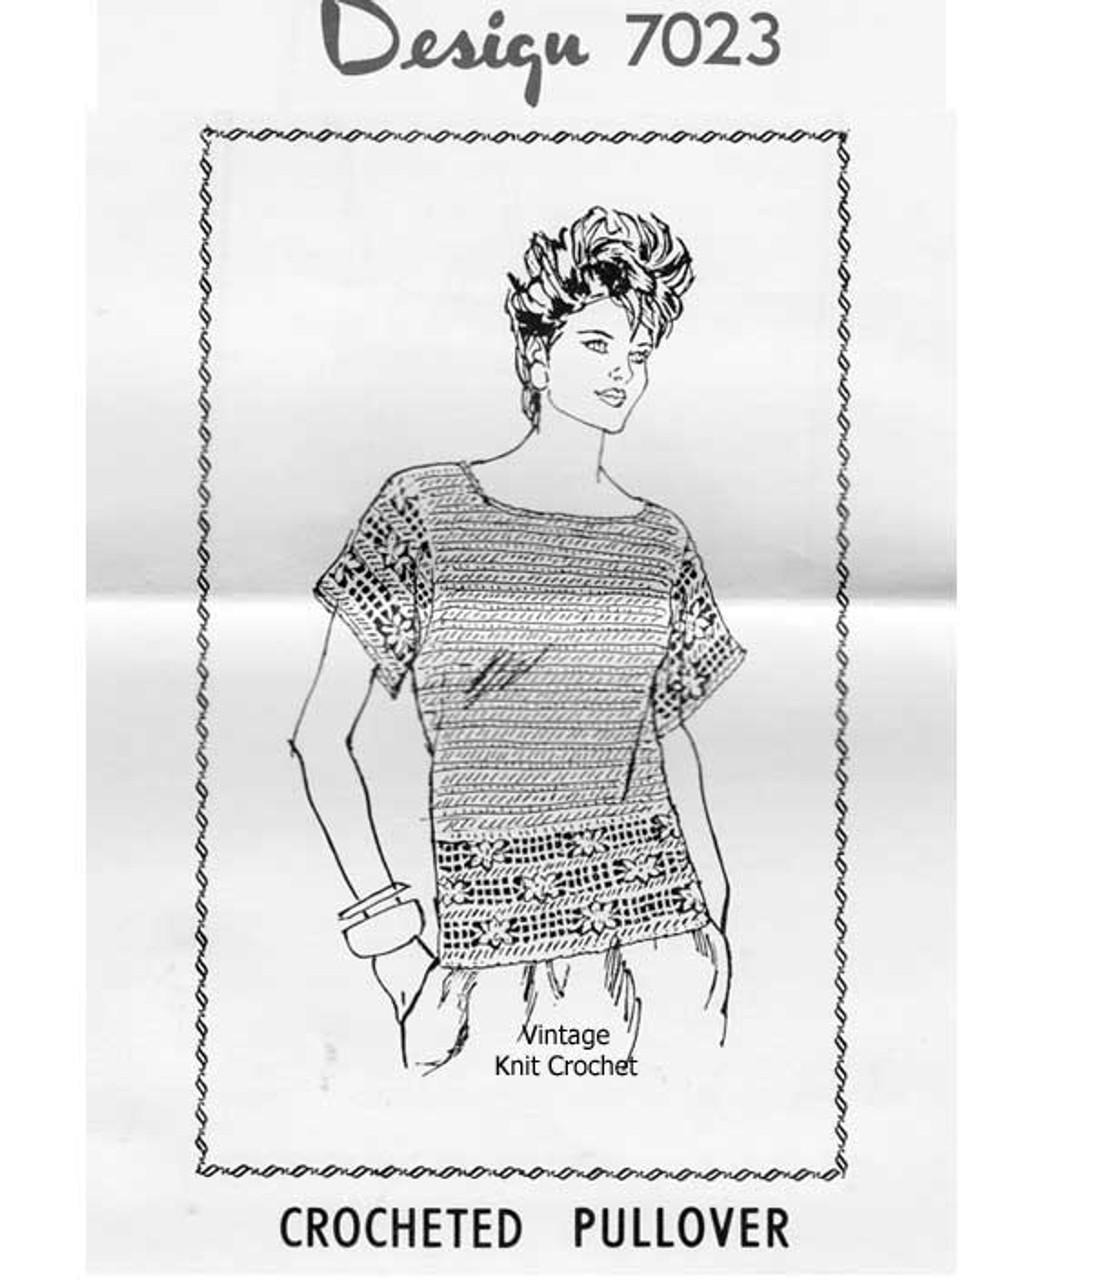 Short Sleeve Crochet Top Pattern, Mail Order Design 7023